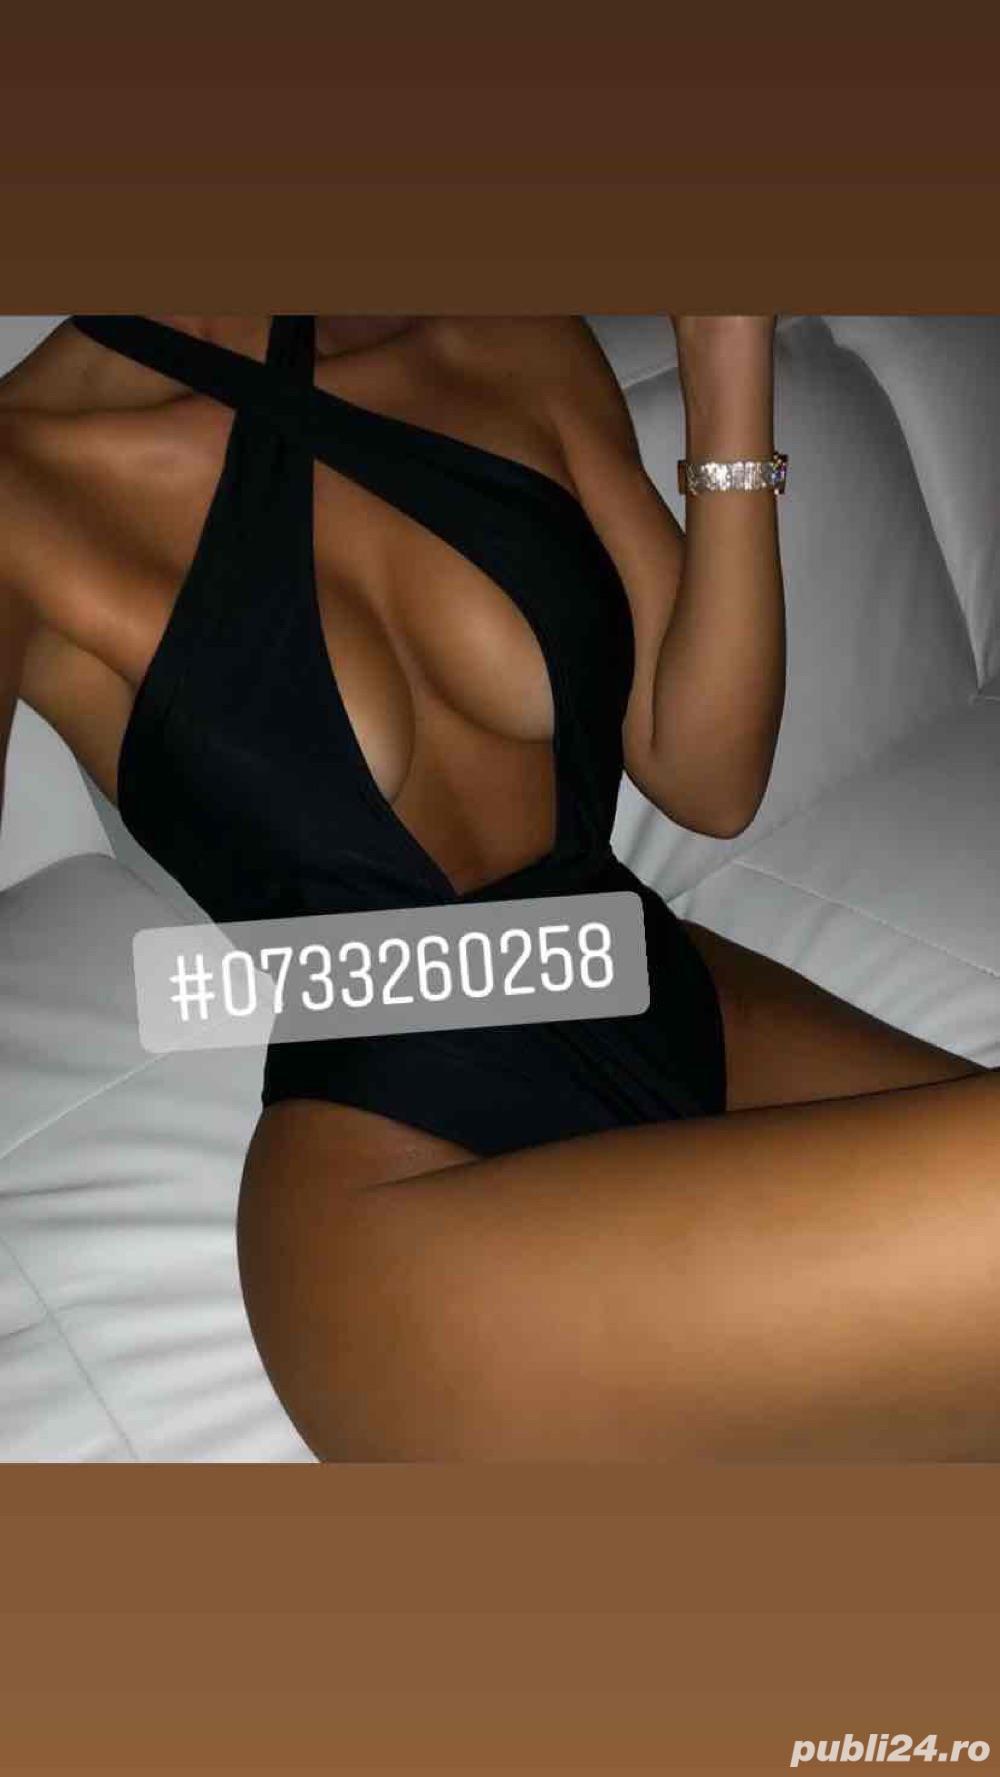 ❗️ L U X U R Y   E S C O R T ❗️ 20 ani  - imagine 4